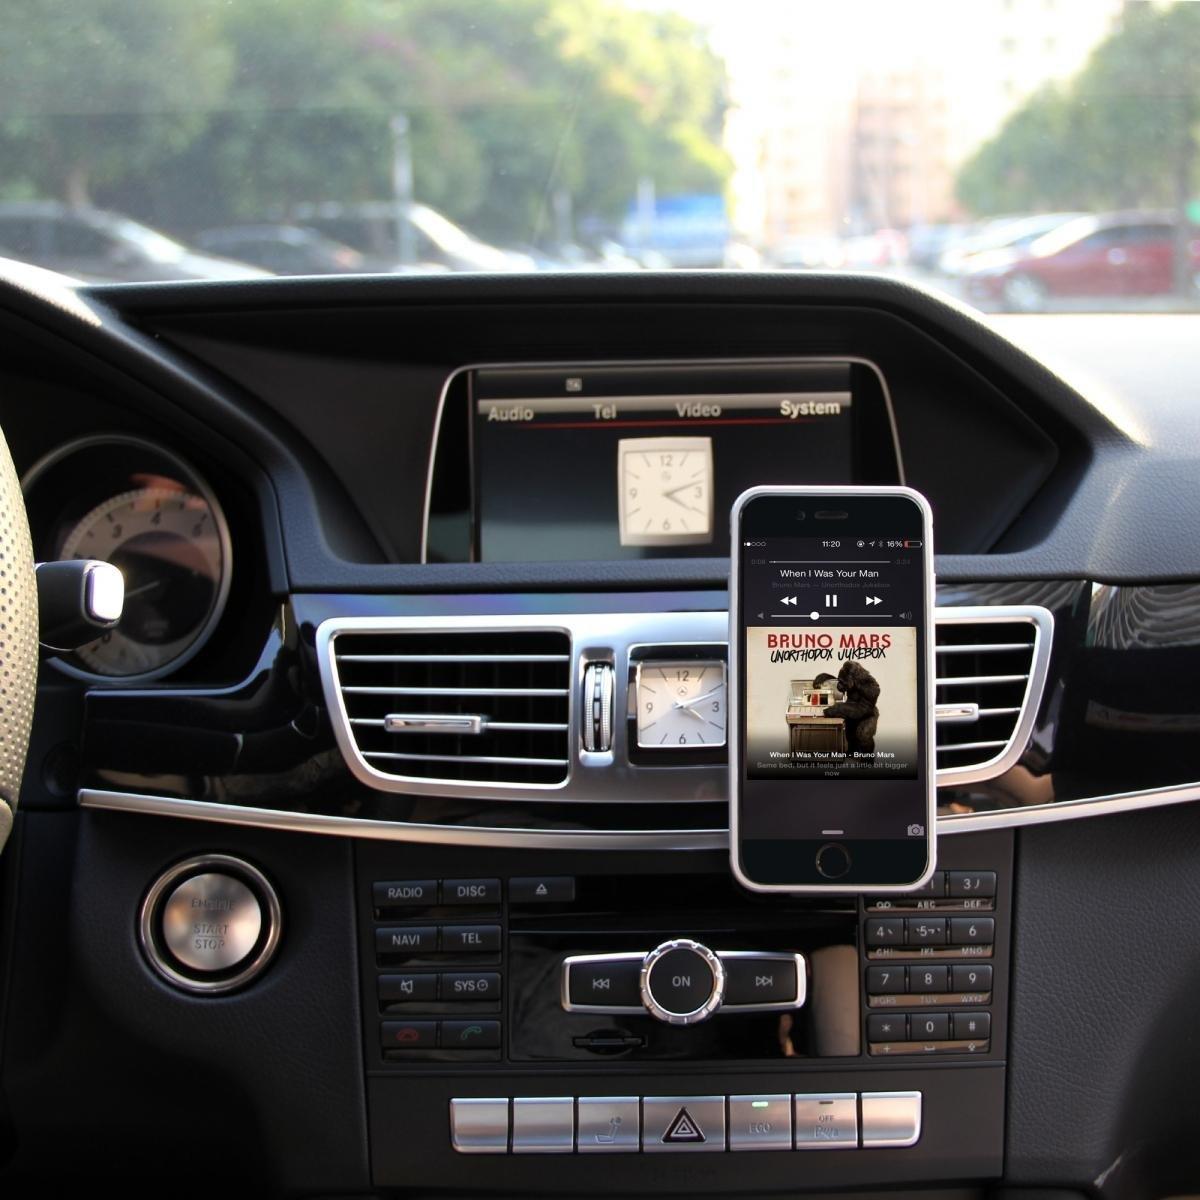 iCleverAir Vent Smartphone Magnetic Holder 6.jpg